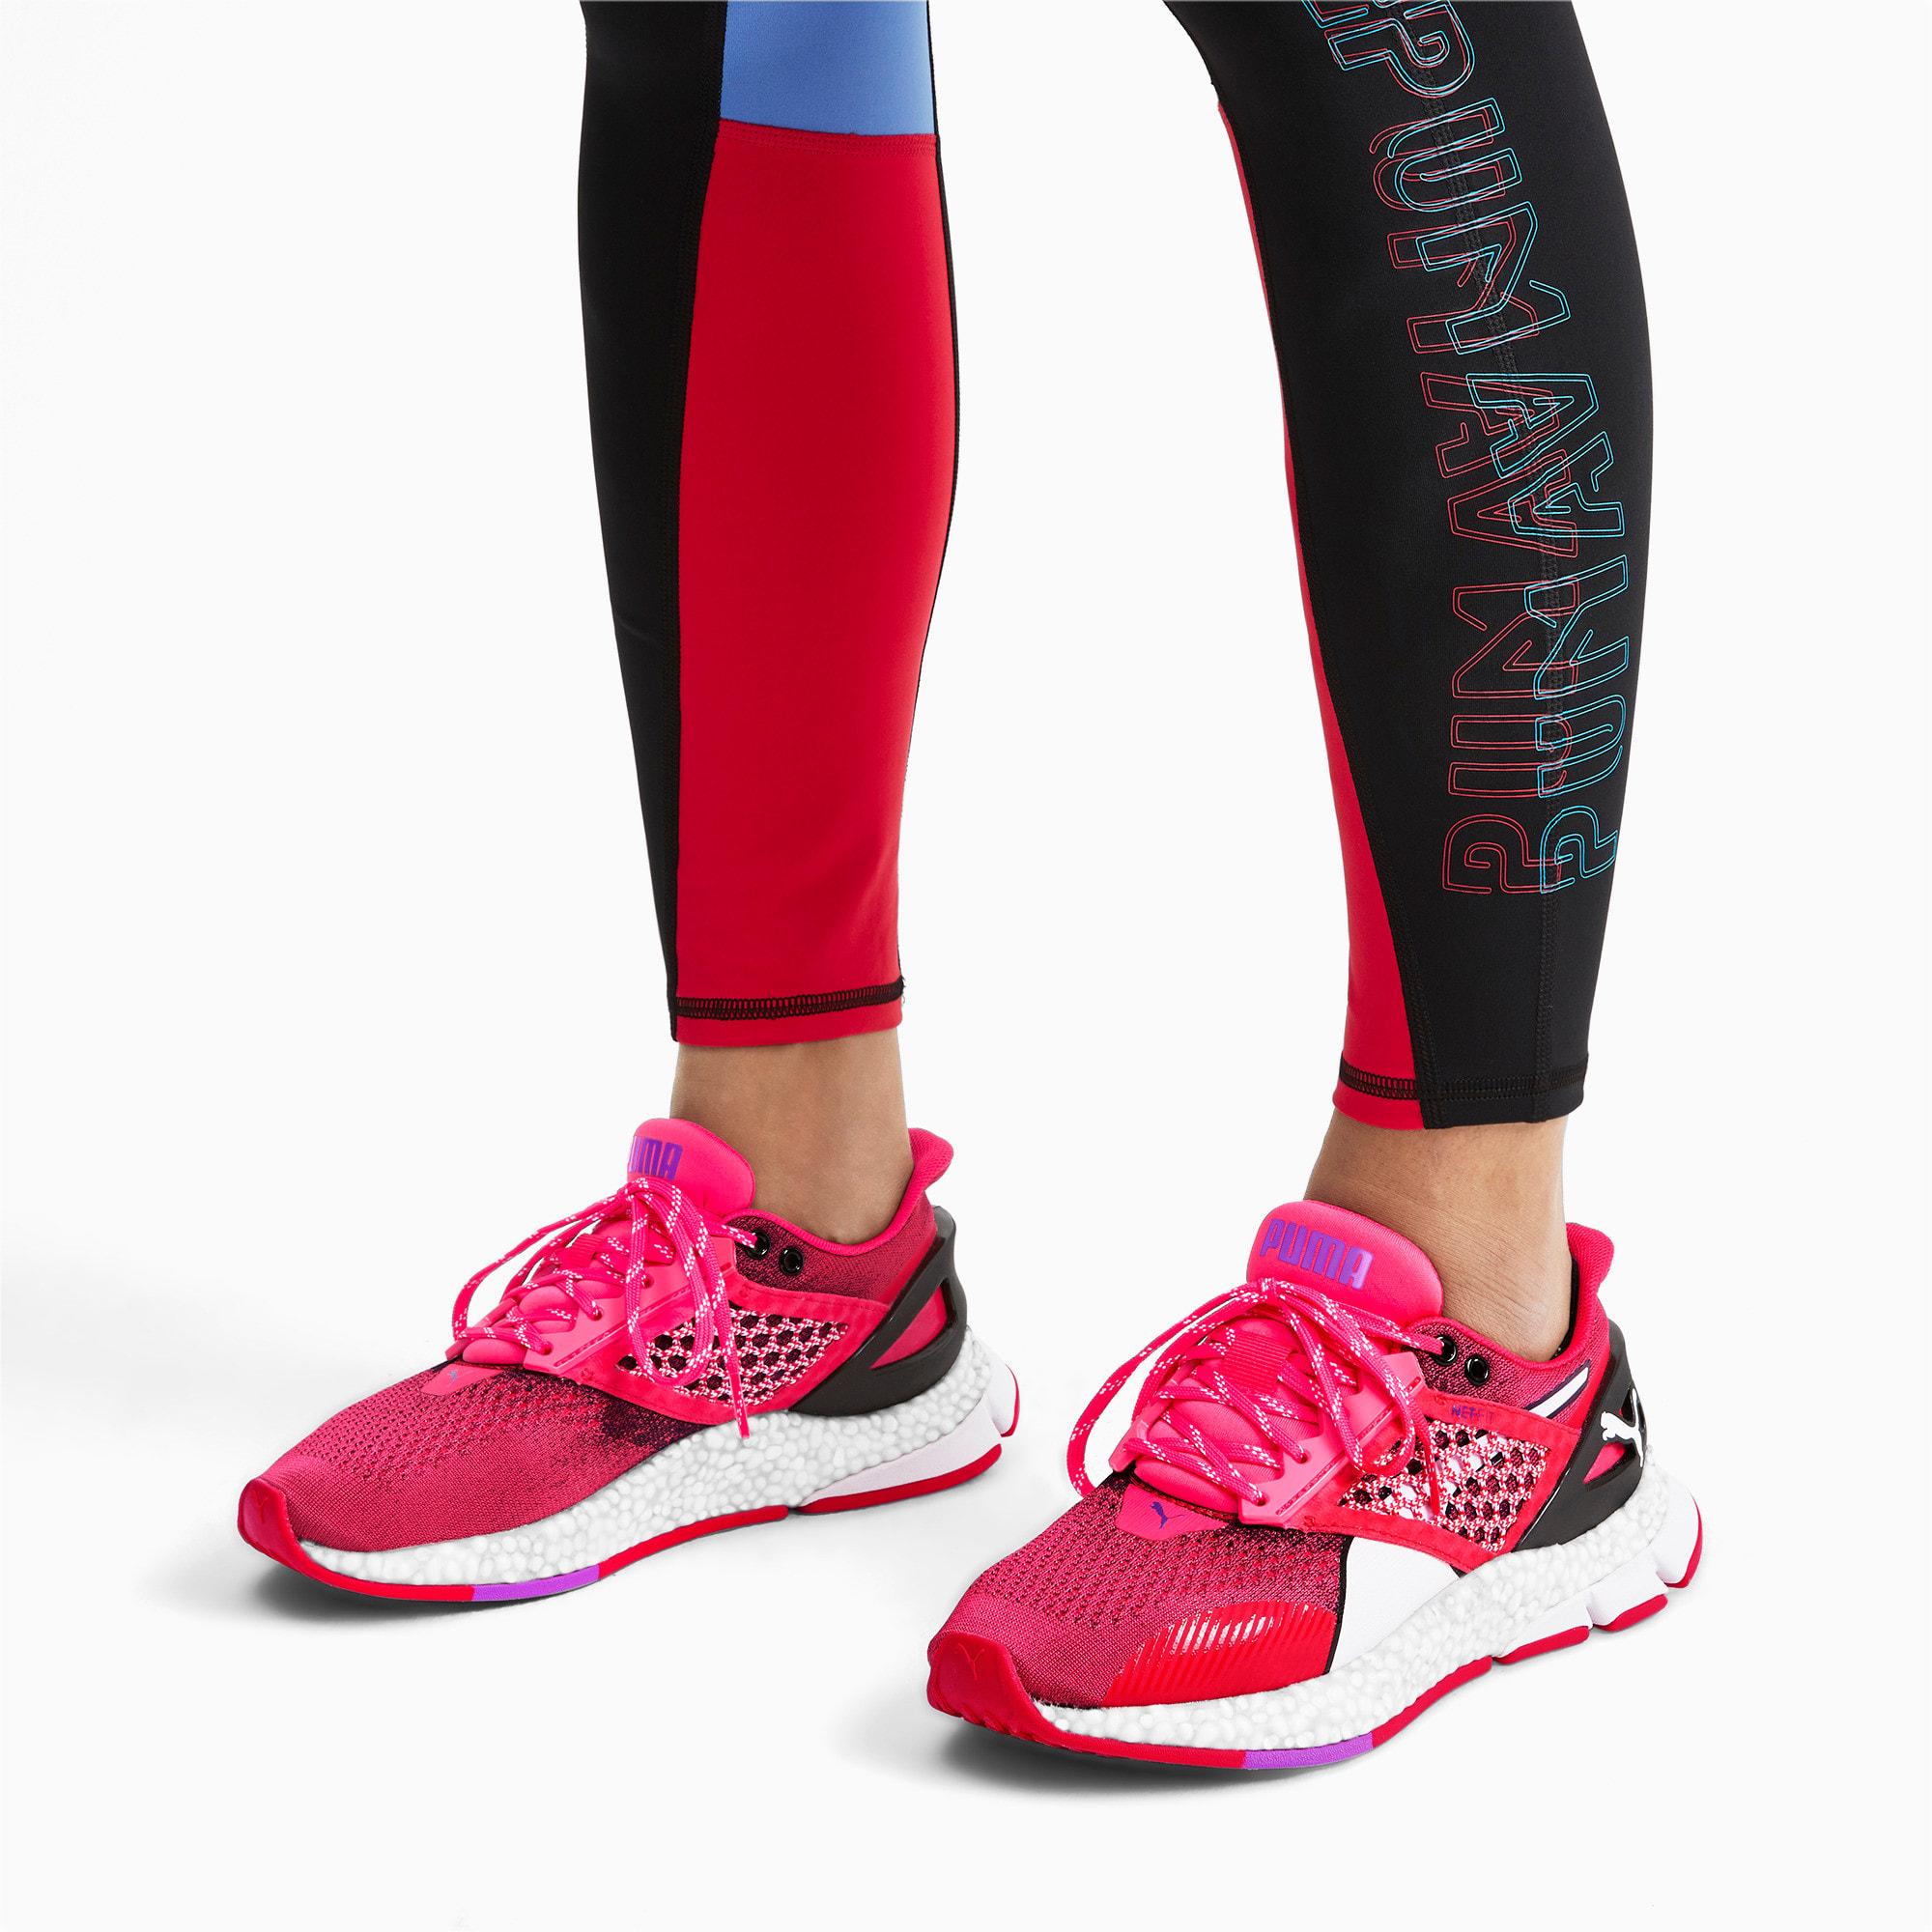 Thumbnail 2 of HYBRID NETFIT Astro Women's Running Shoes, Nrgy Rose-Puma Black, medium